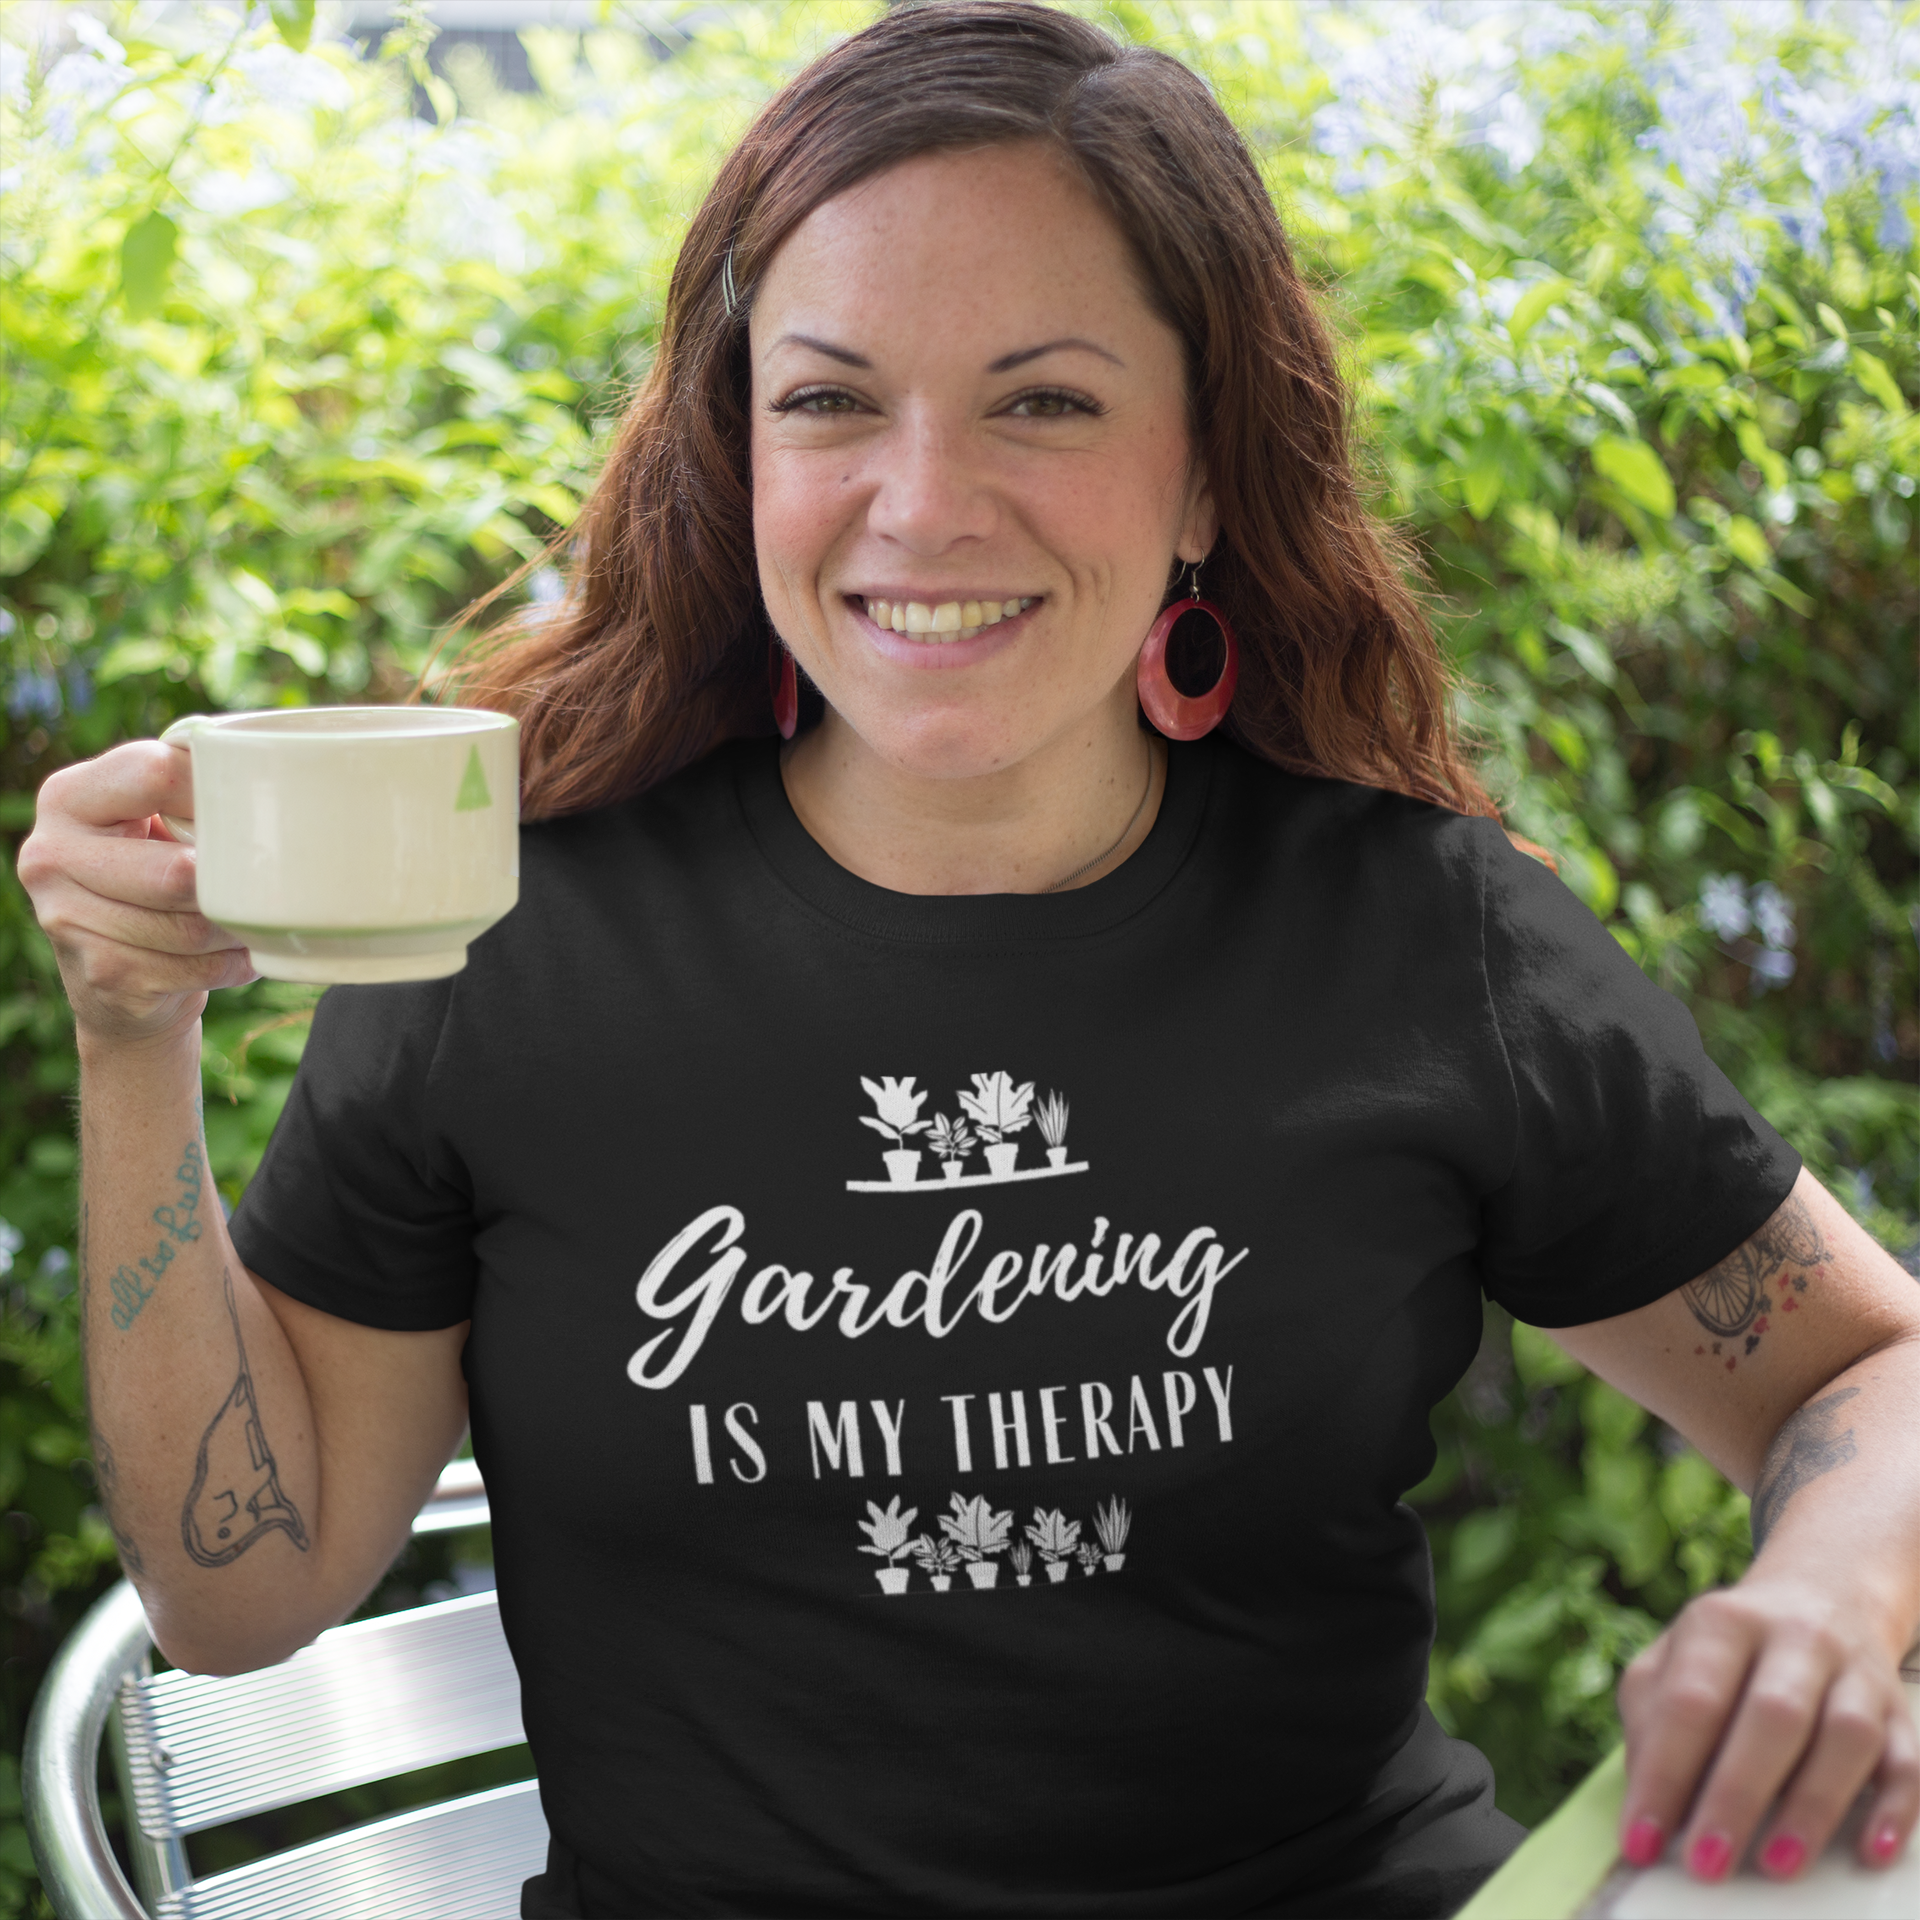 Plant Lover Shirt DTG Gardening Shirt Funny Gardening Shirt Gardener Gift Gardening Is My Therapy Shirt Gardening Gift Gardener Shirt